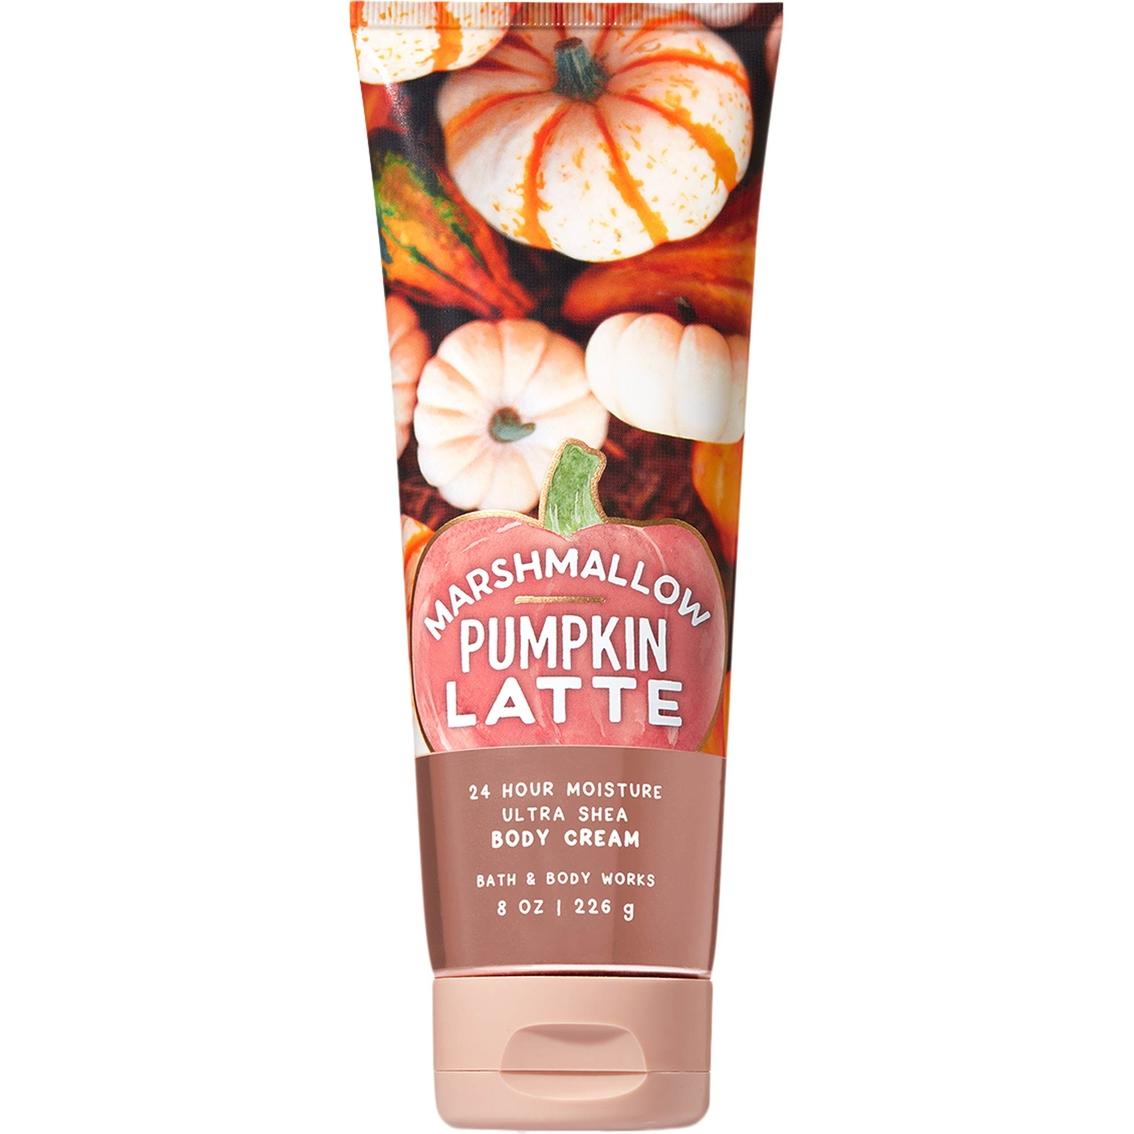 Bath & Body Works Marshmallow Pumpkin Latte Body Cream